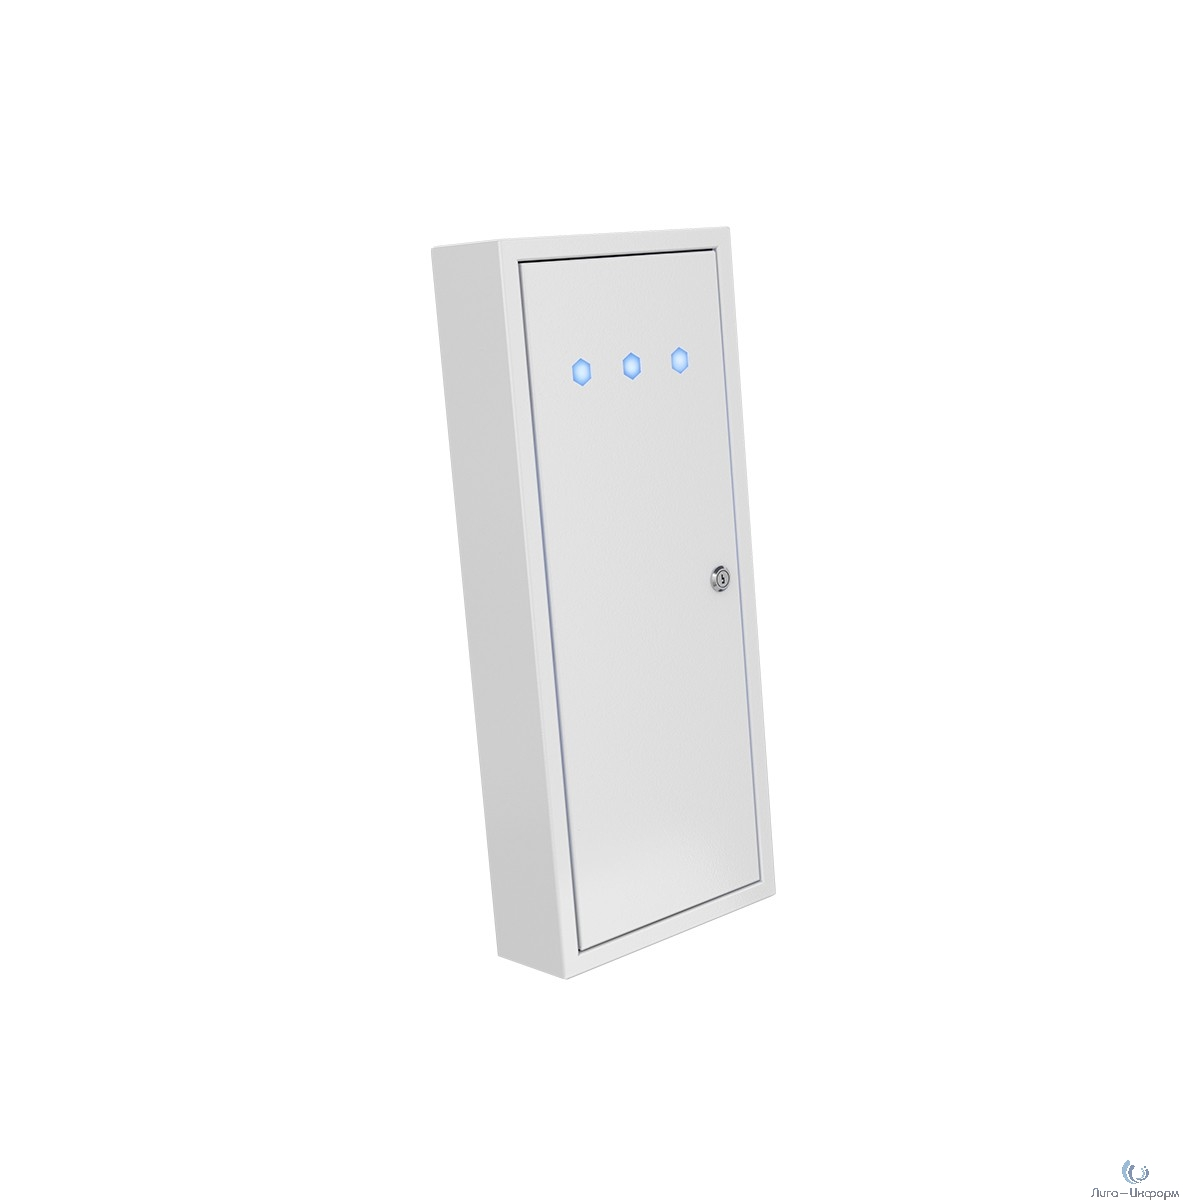 LEDeffect LE-СБО-63-060-5450-20 Антивирус Пром